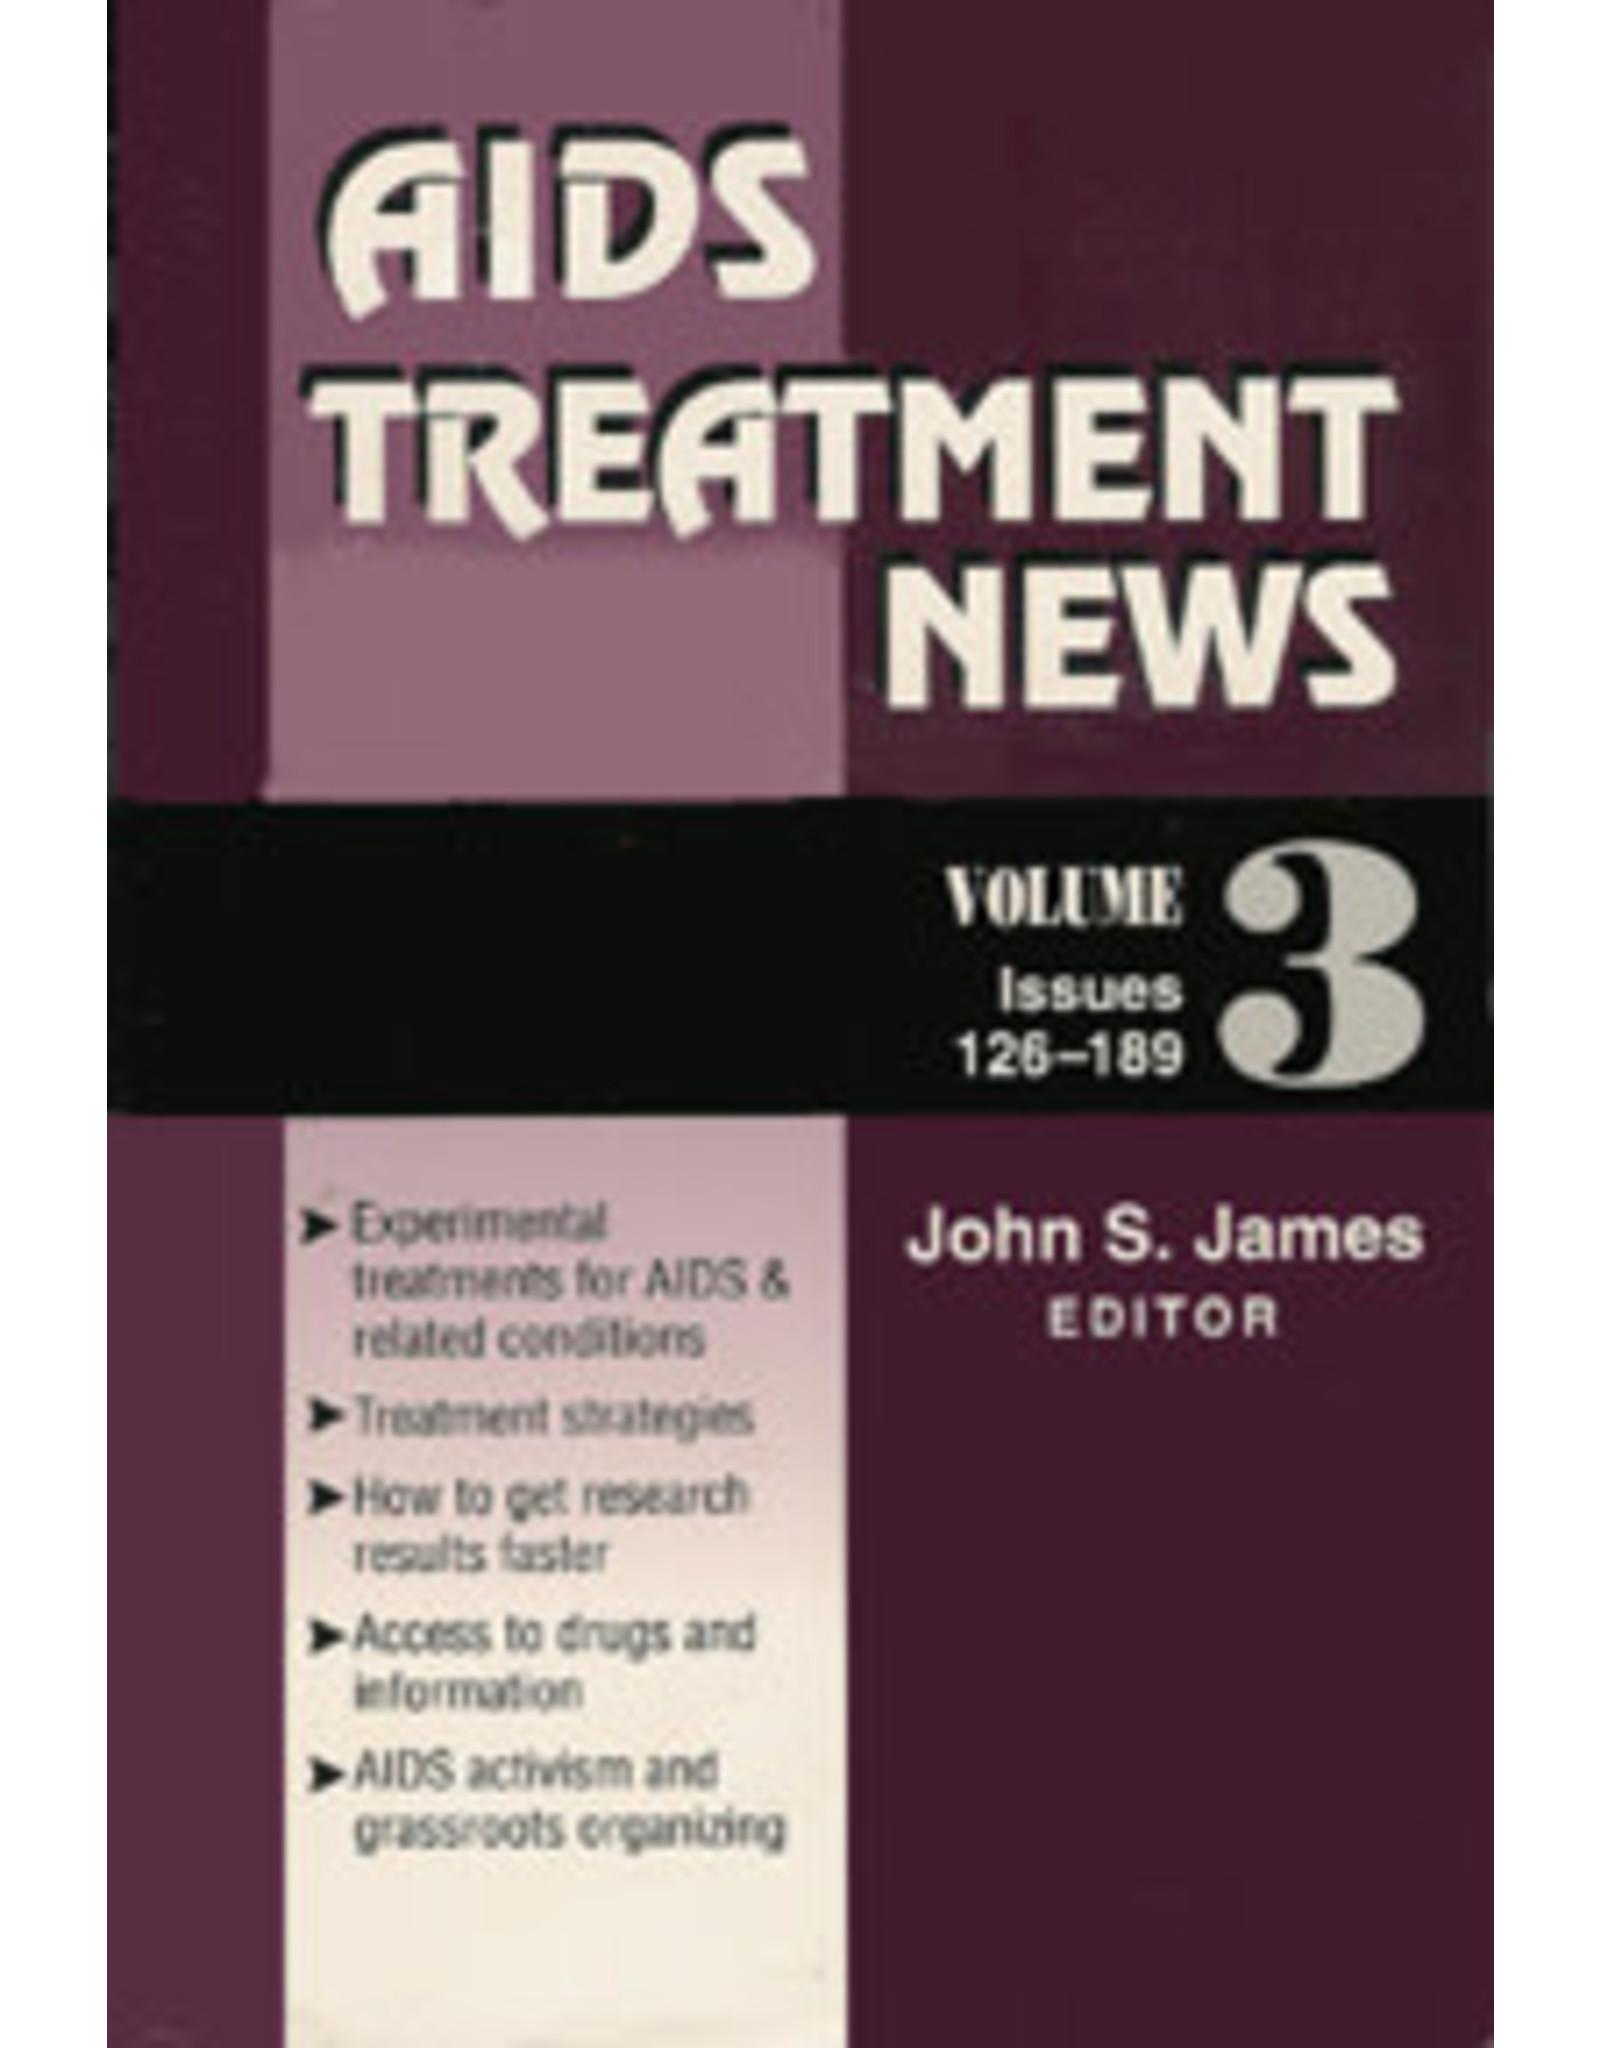 AIDS TREATMENT NEWS